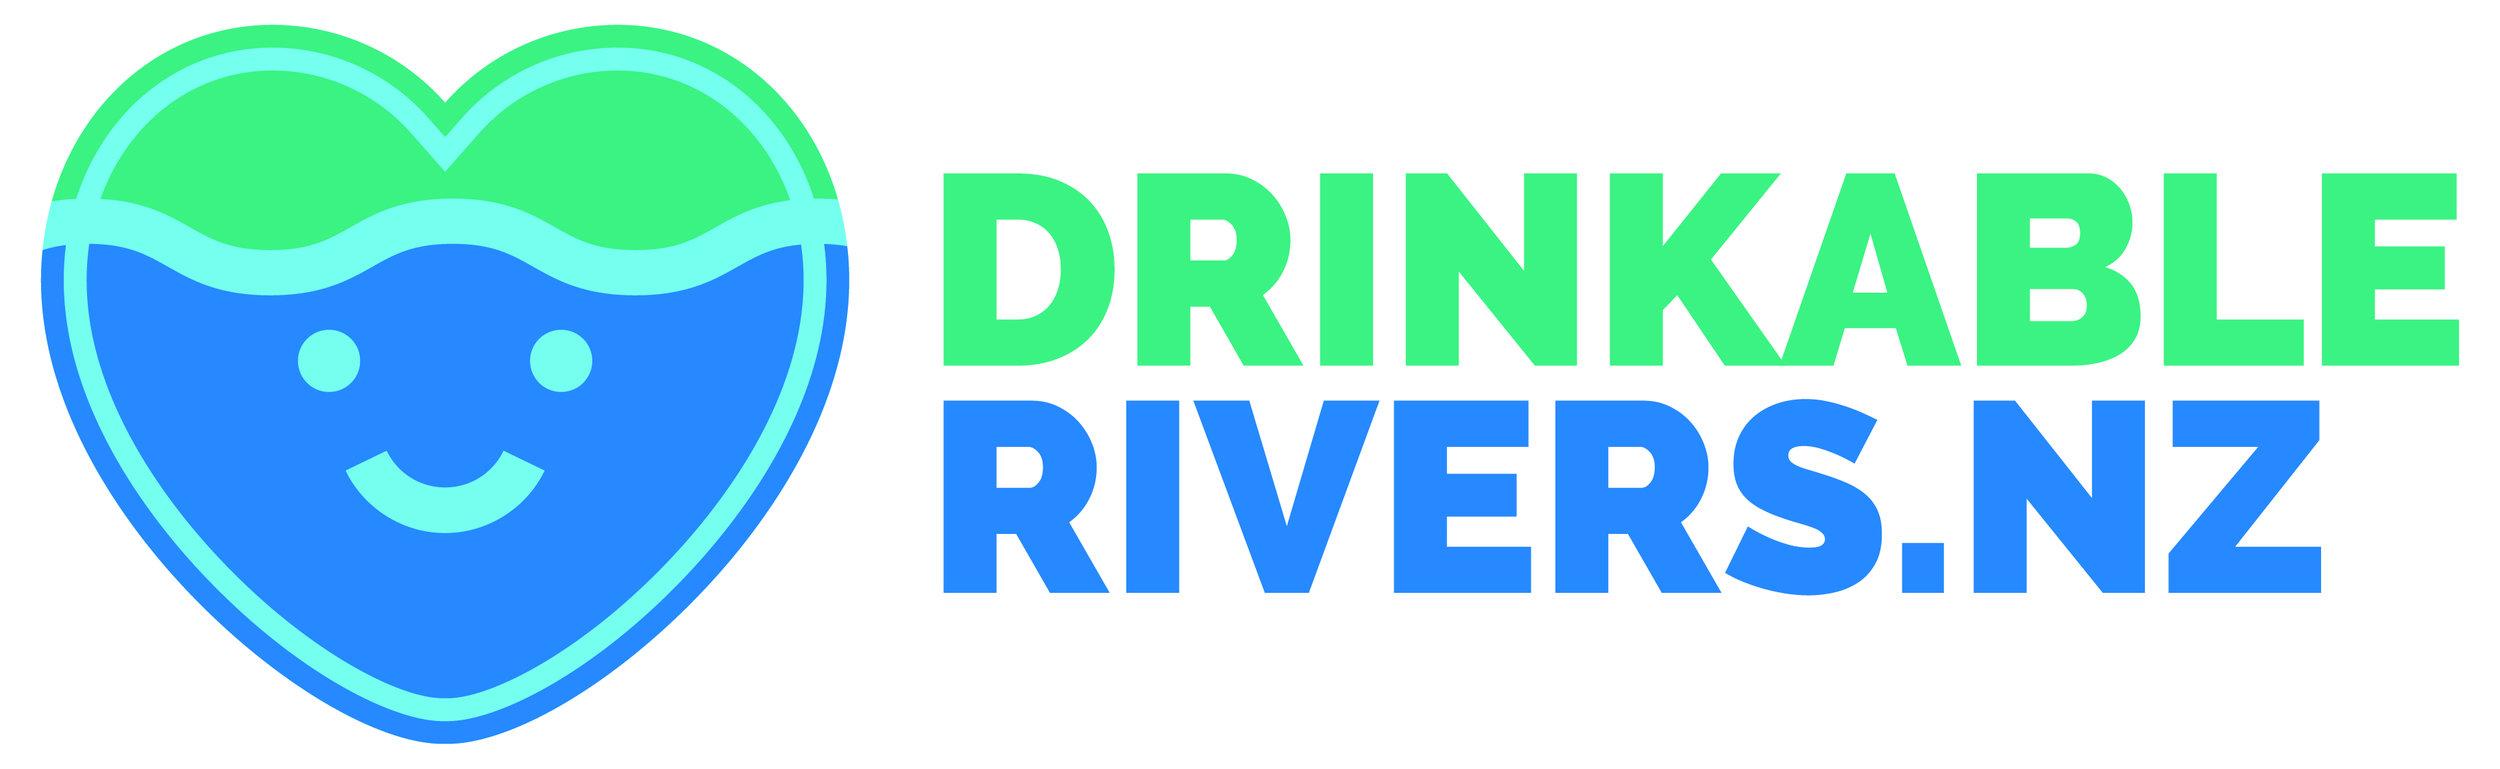 Drinkable Rivers HORIZONTAL-Colour.jpg